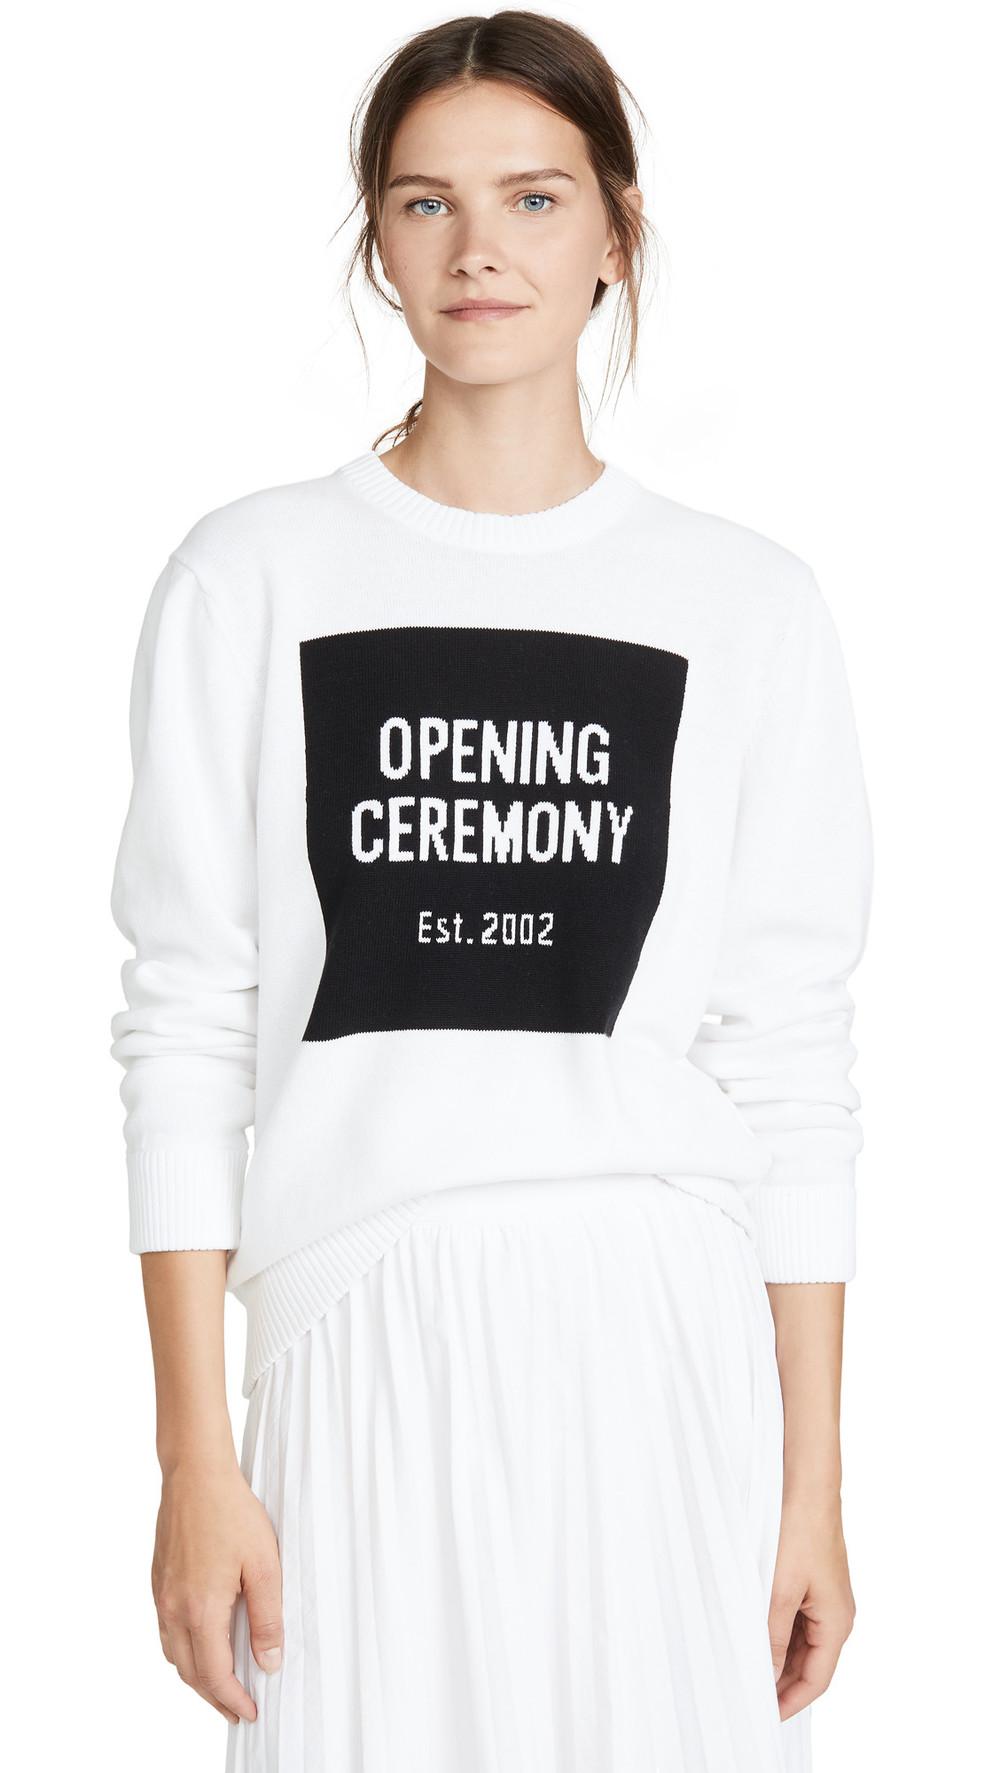 Opening Ceremony Box Logo Crew Neck Sweater in white / multi